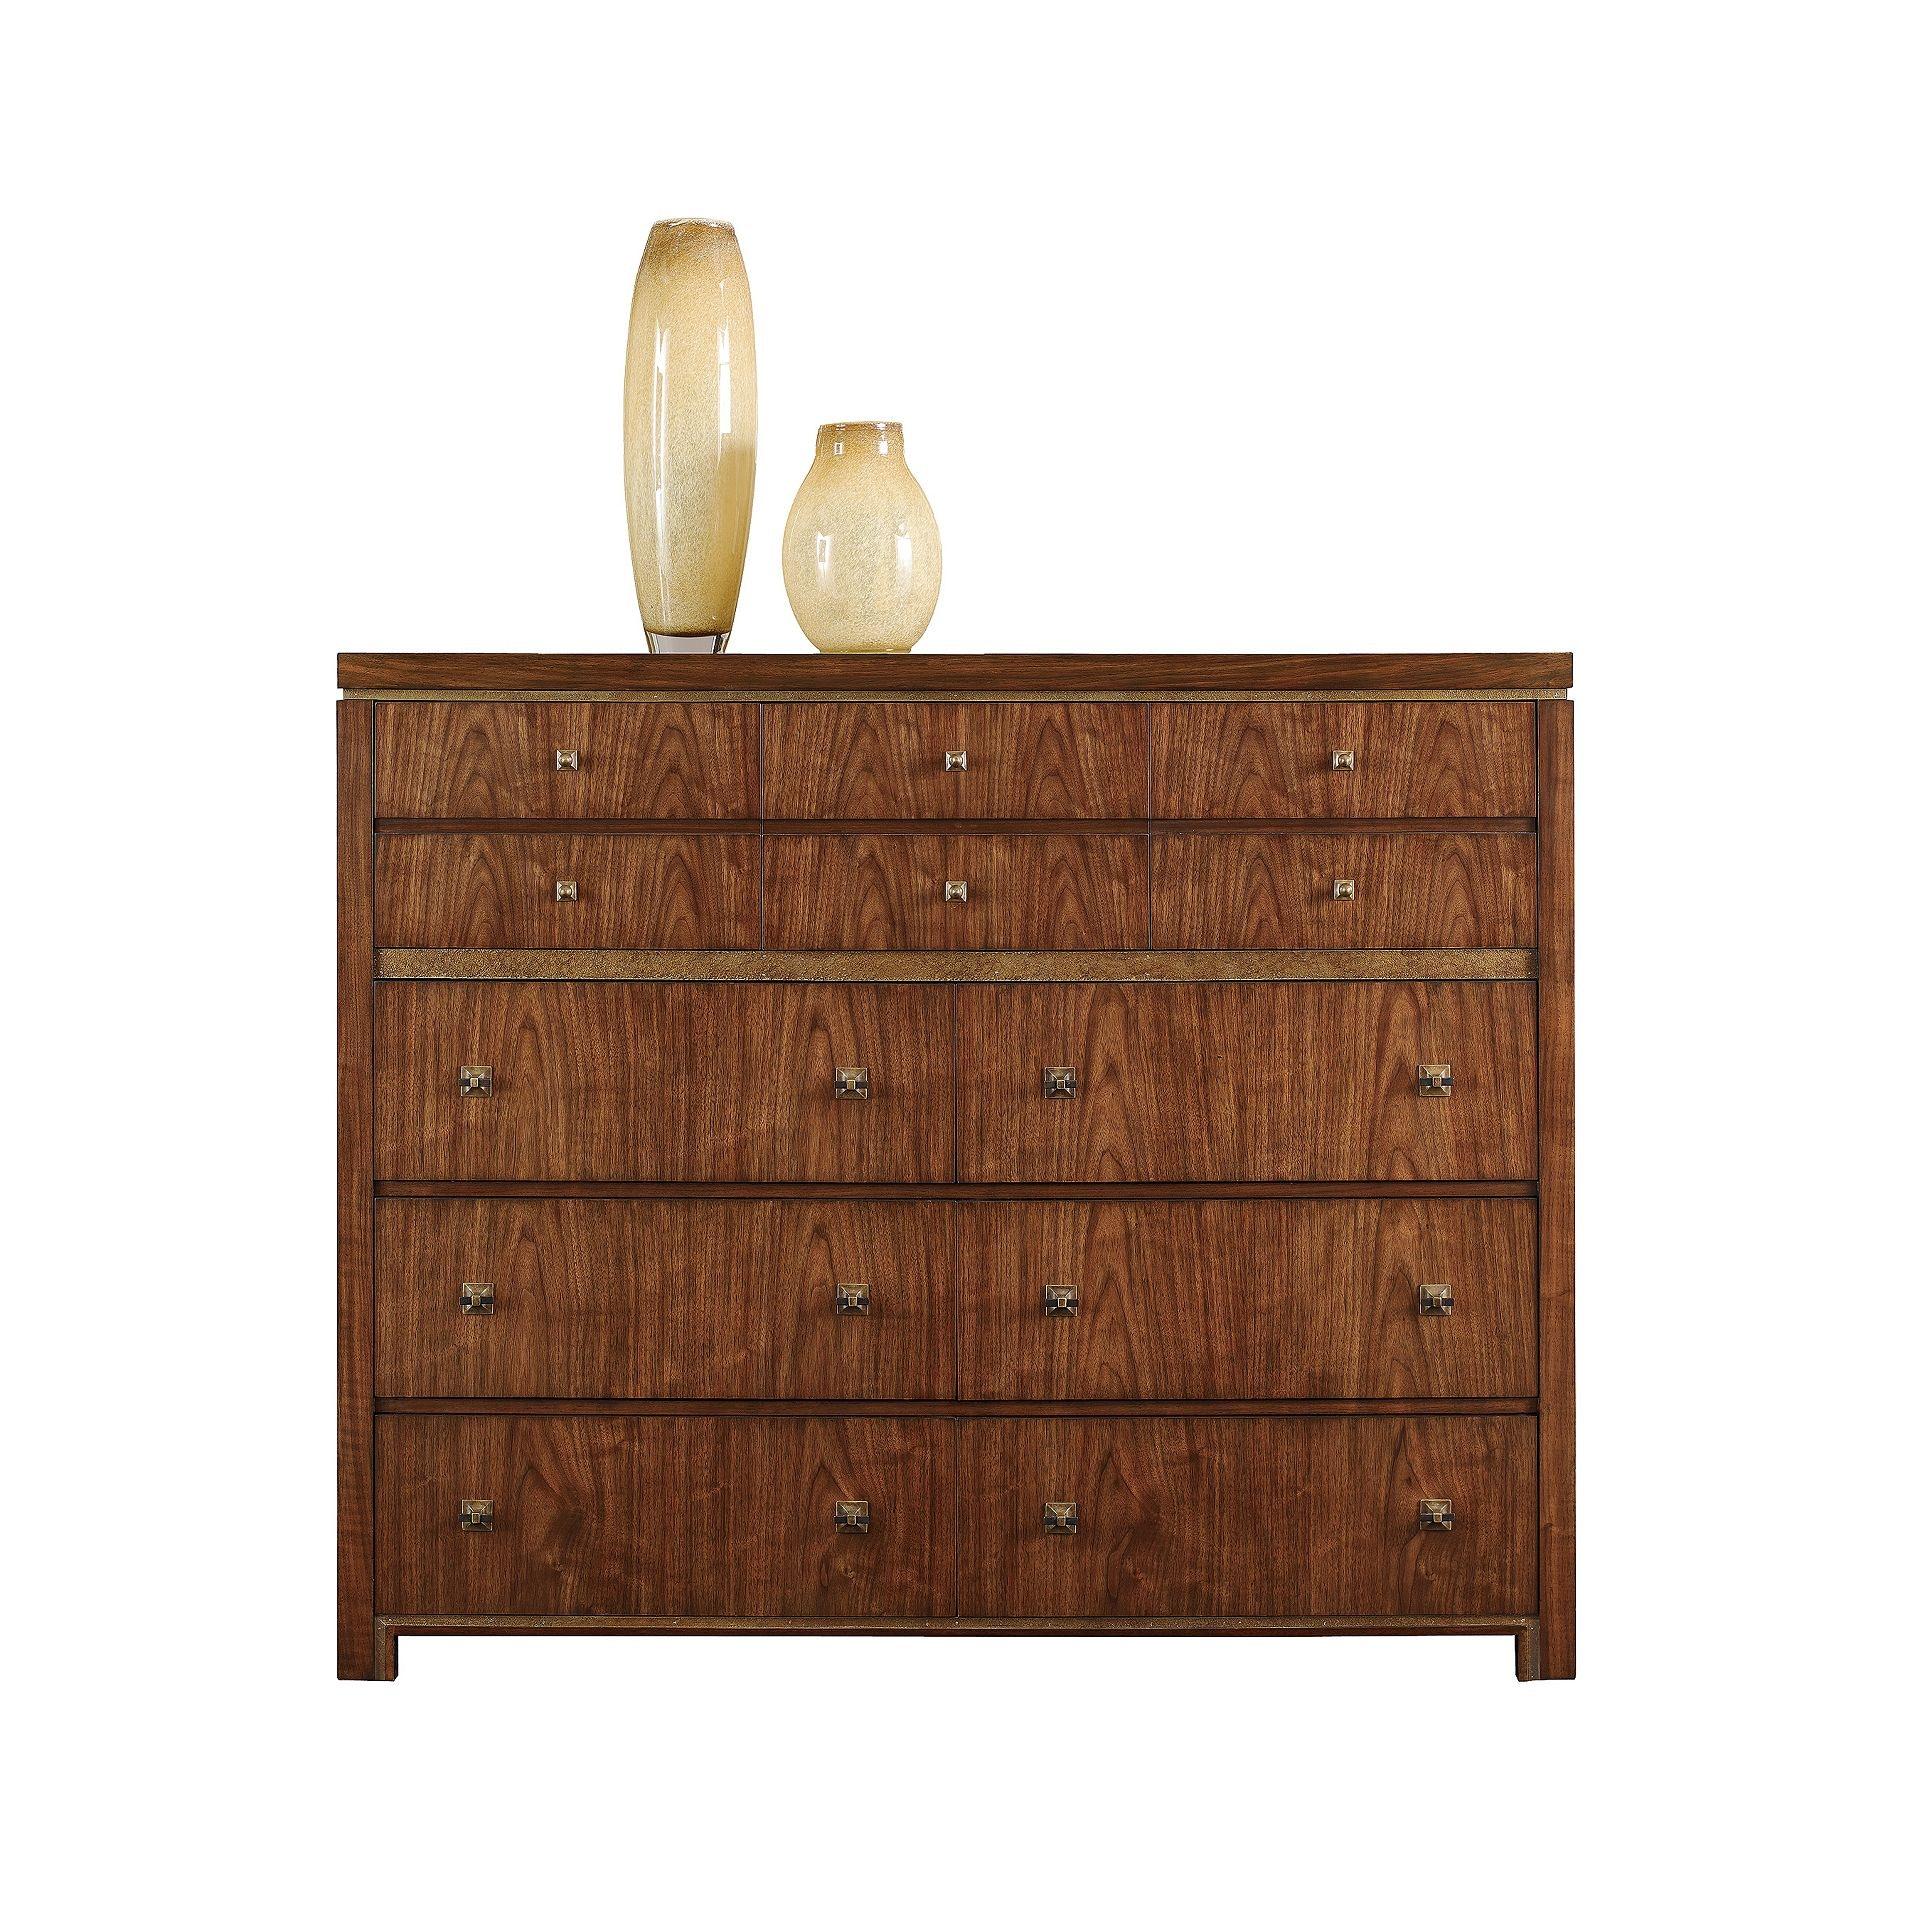 Henredon Furniture Venue Gentlemenu0027s Chest 7100 05